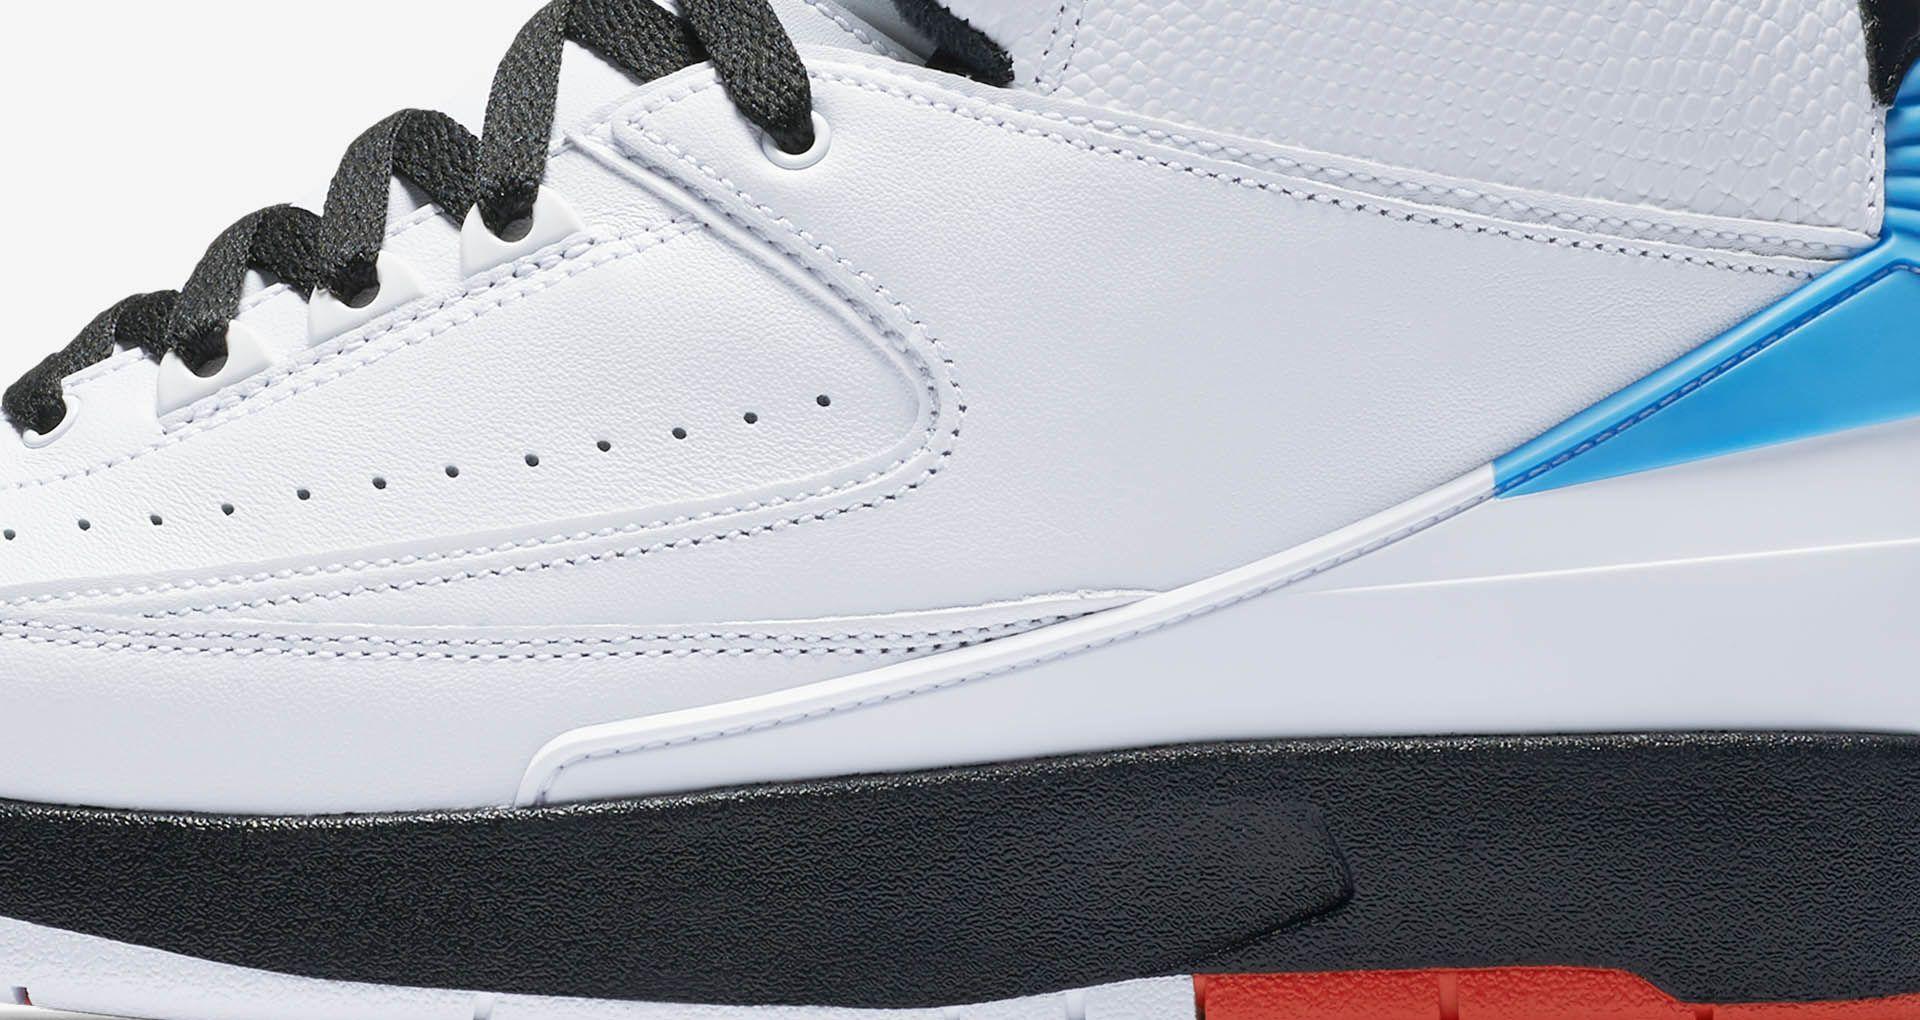 46a7c201170 Air Jordan x Converse Pack 2017 Release Date. Nike+ SNKRS